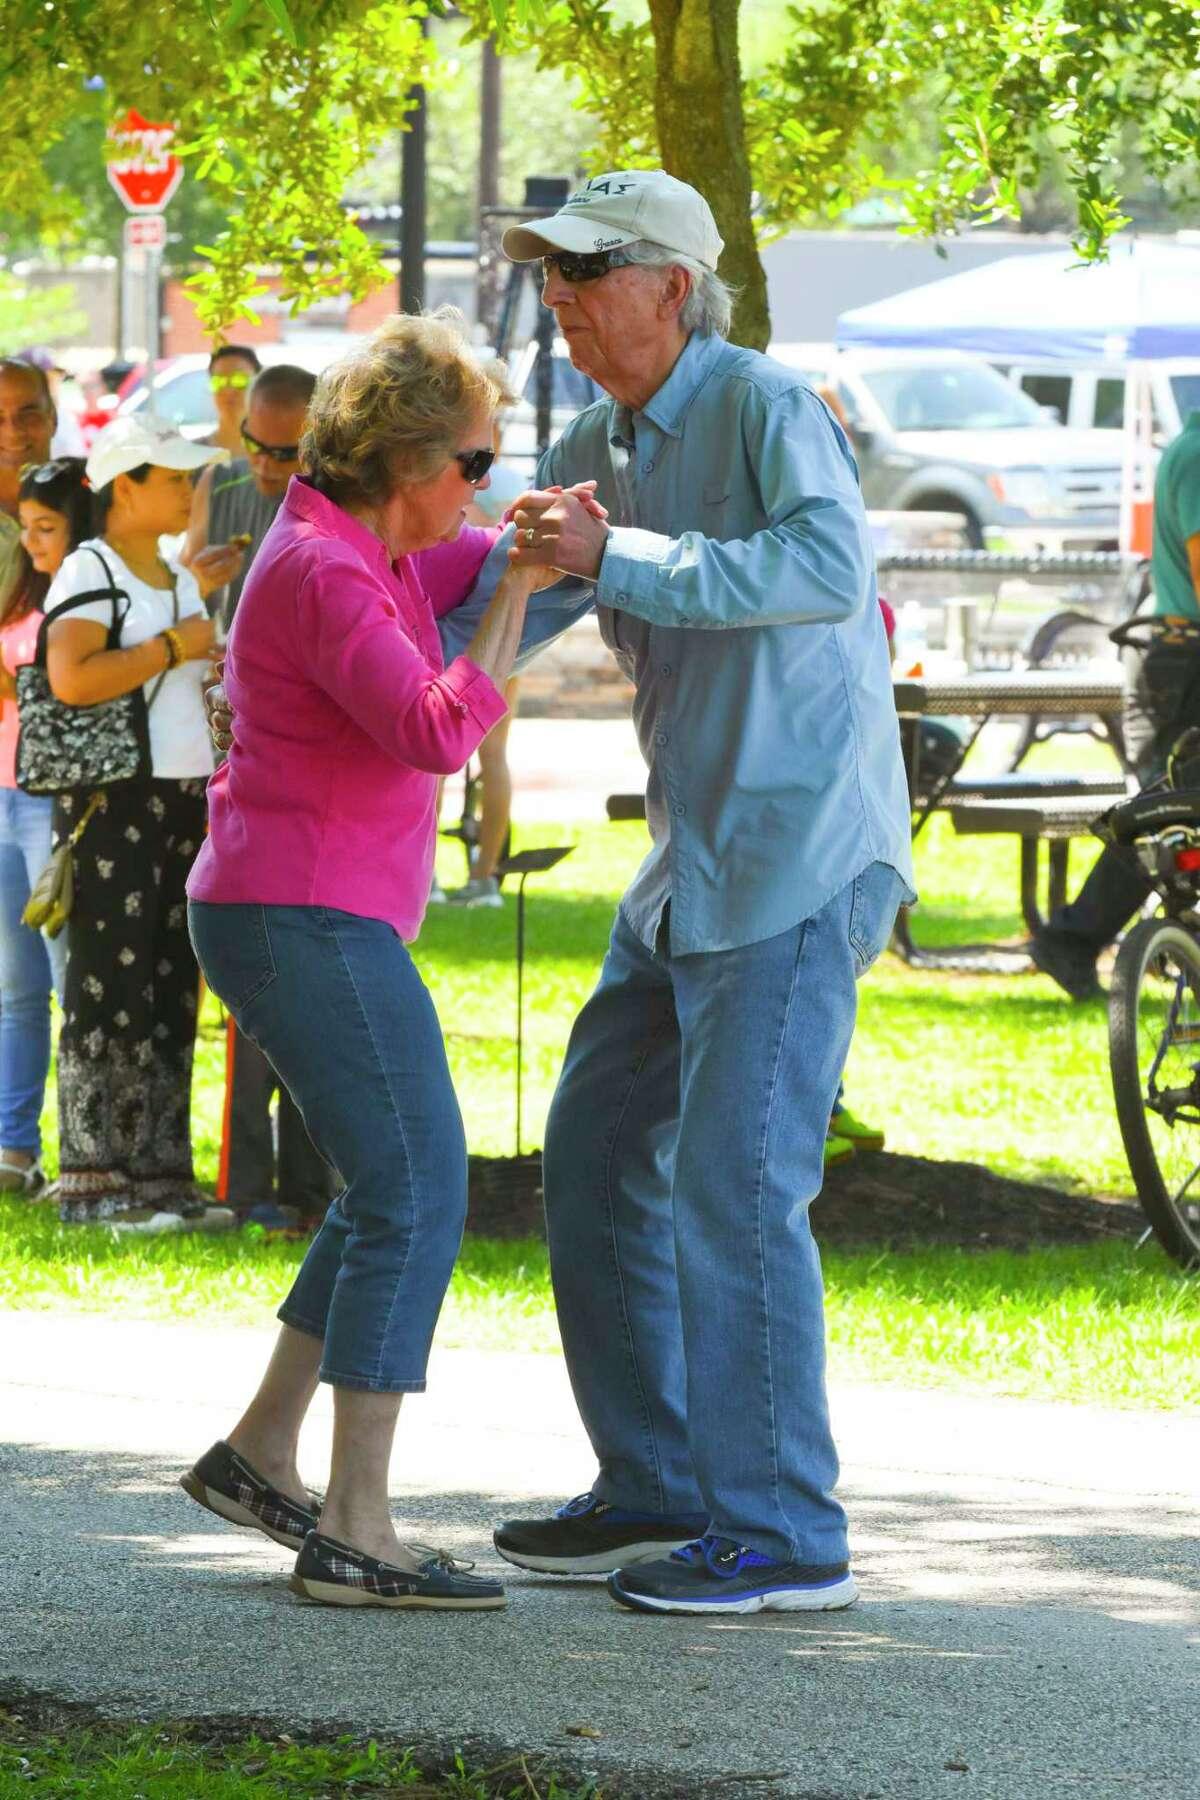 Joyce and Syl Kontowicz dance away the time at the Mudbug Festival